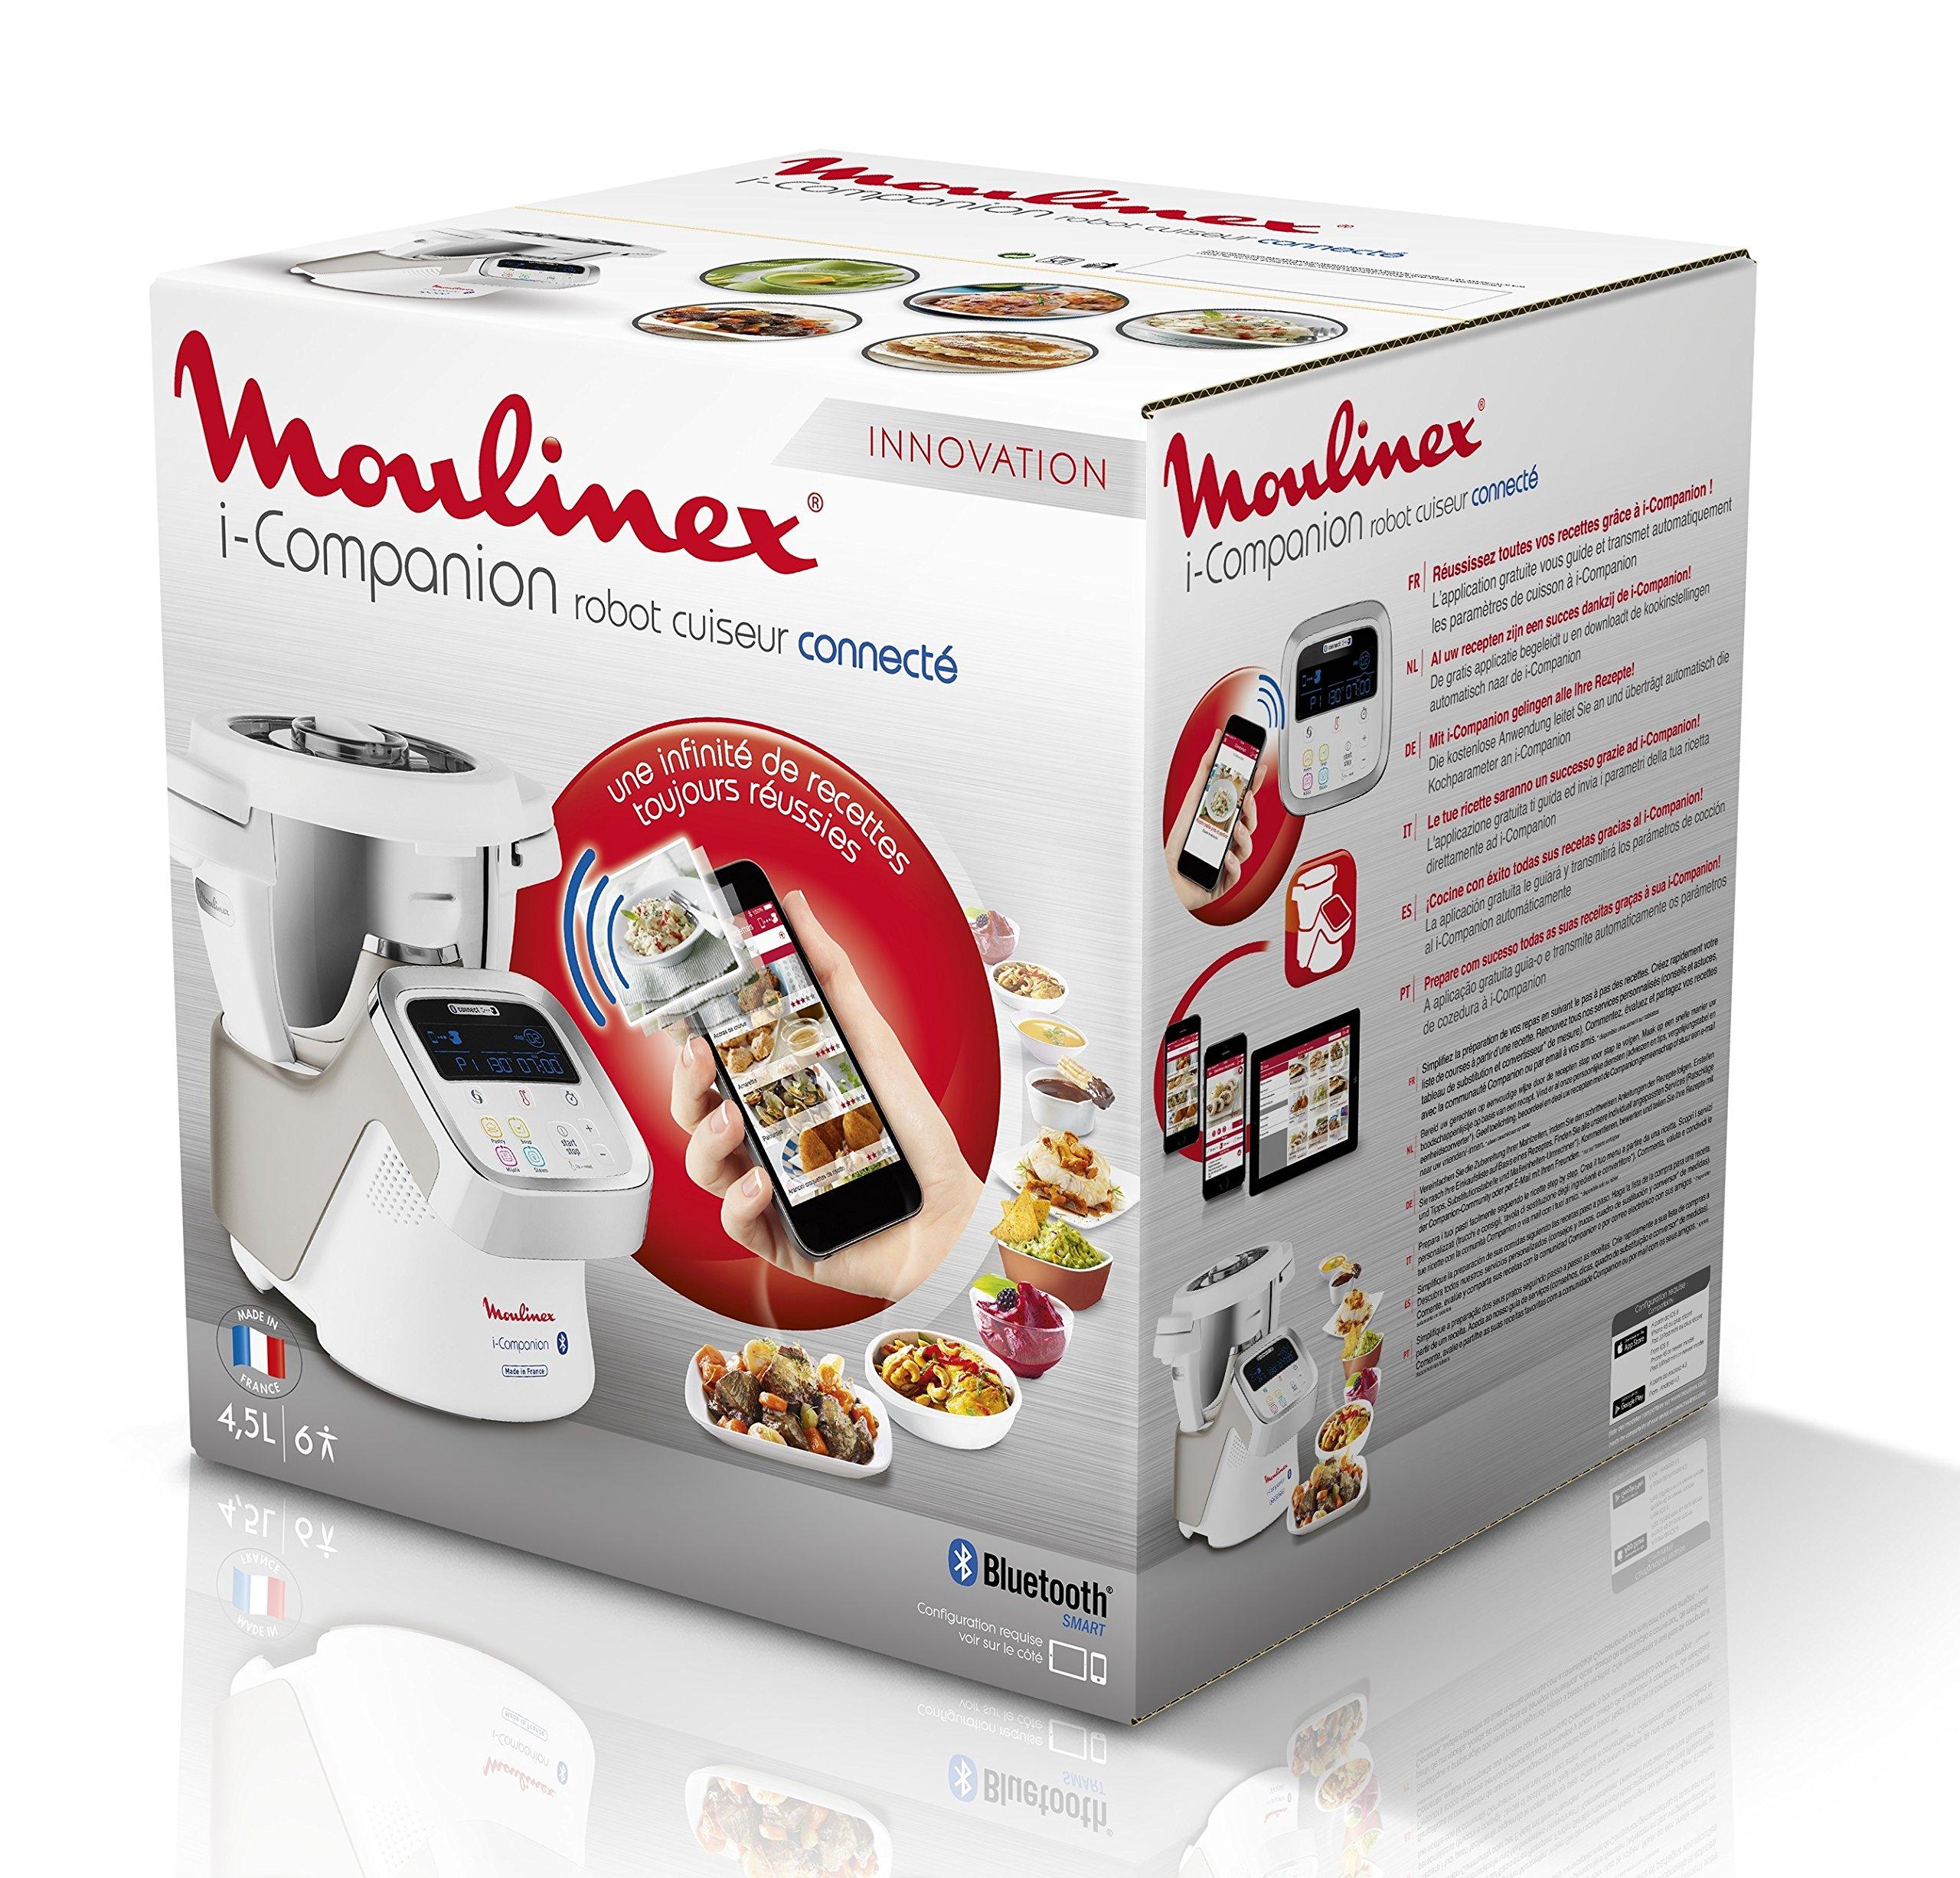 Moulinex-hf9001-i-companion-Multifunktions-Kchenmaschine